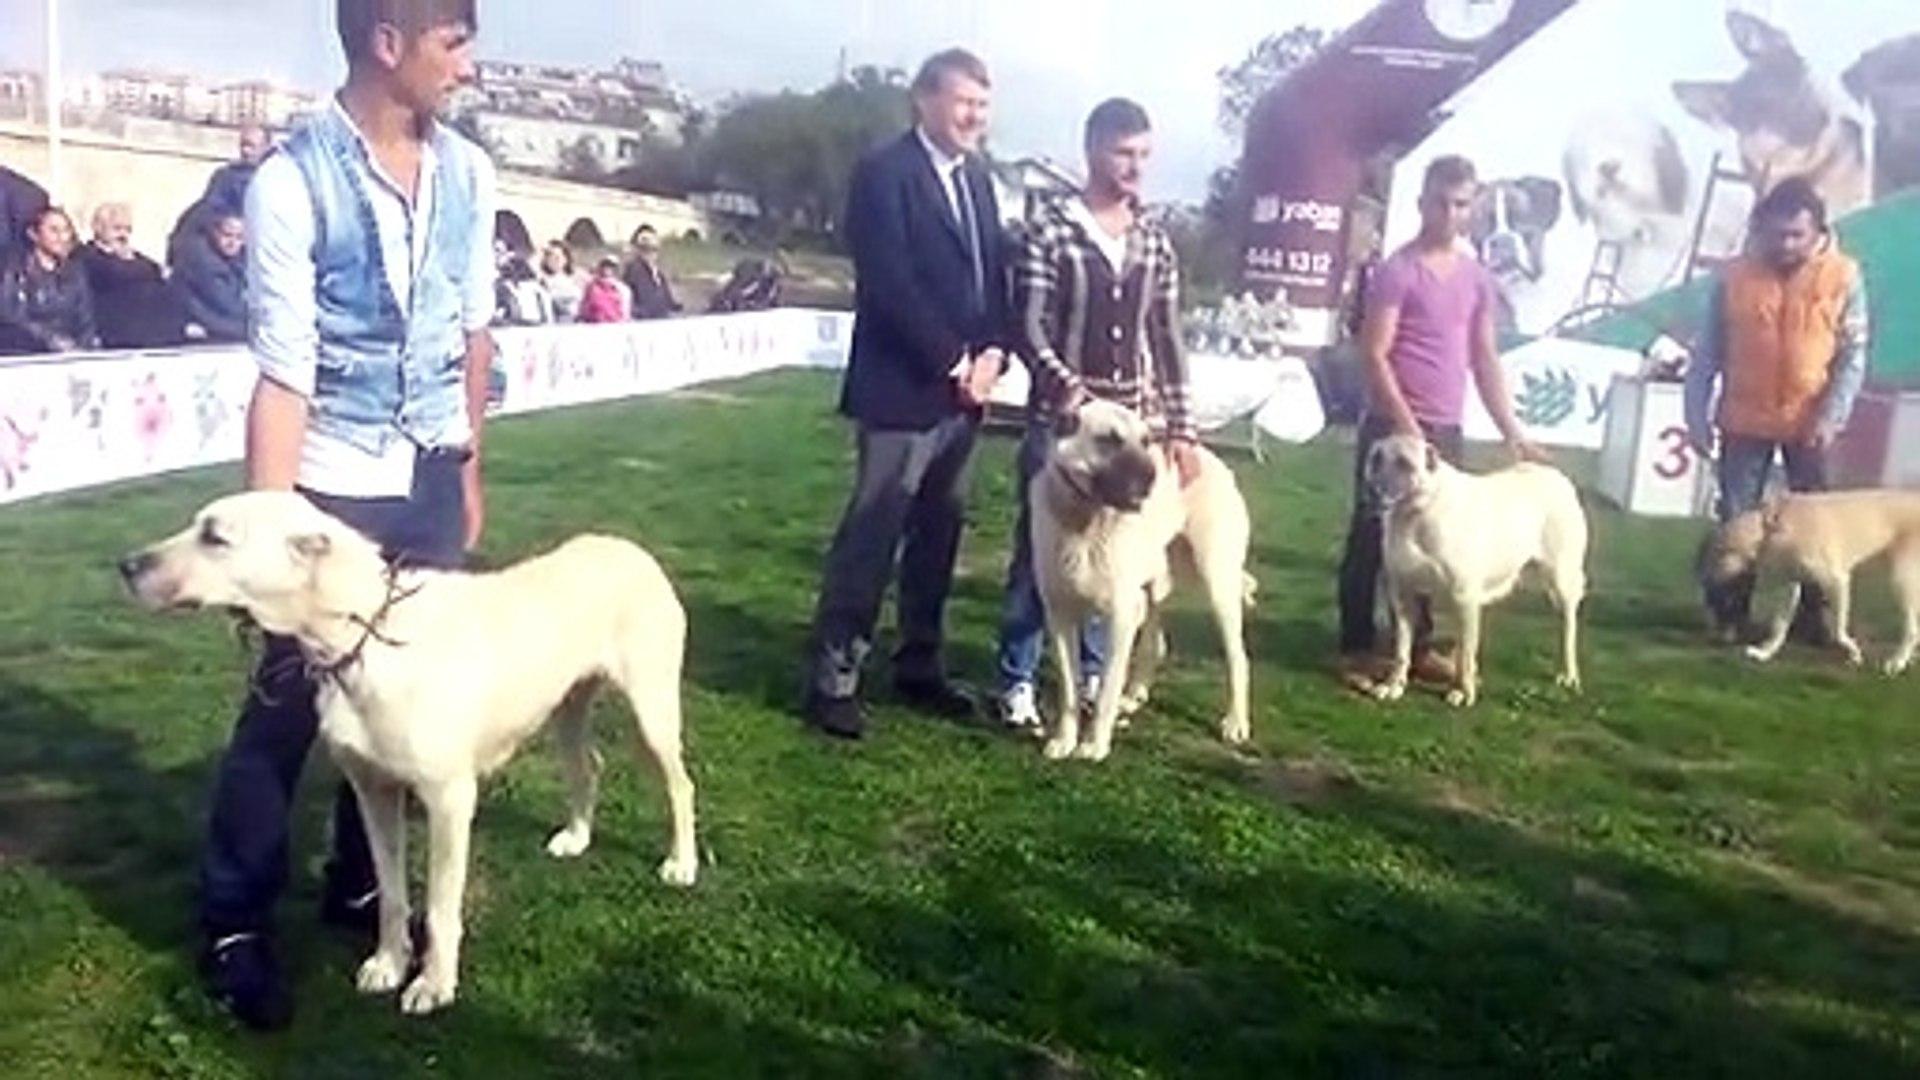 SiLiVRi BELEDiYESiNCE DUZENLENEN SiVAS KANGAL KOPEK YARISMASI - KANGAL SHEPHERD DOGS DOGSHOW